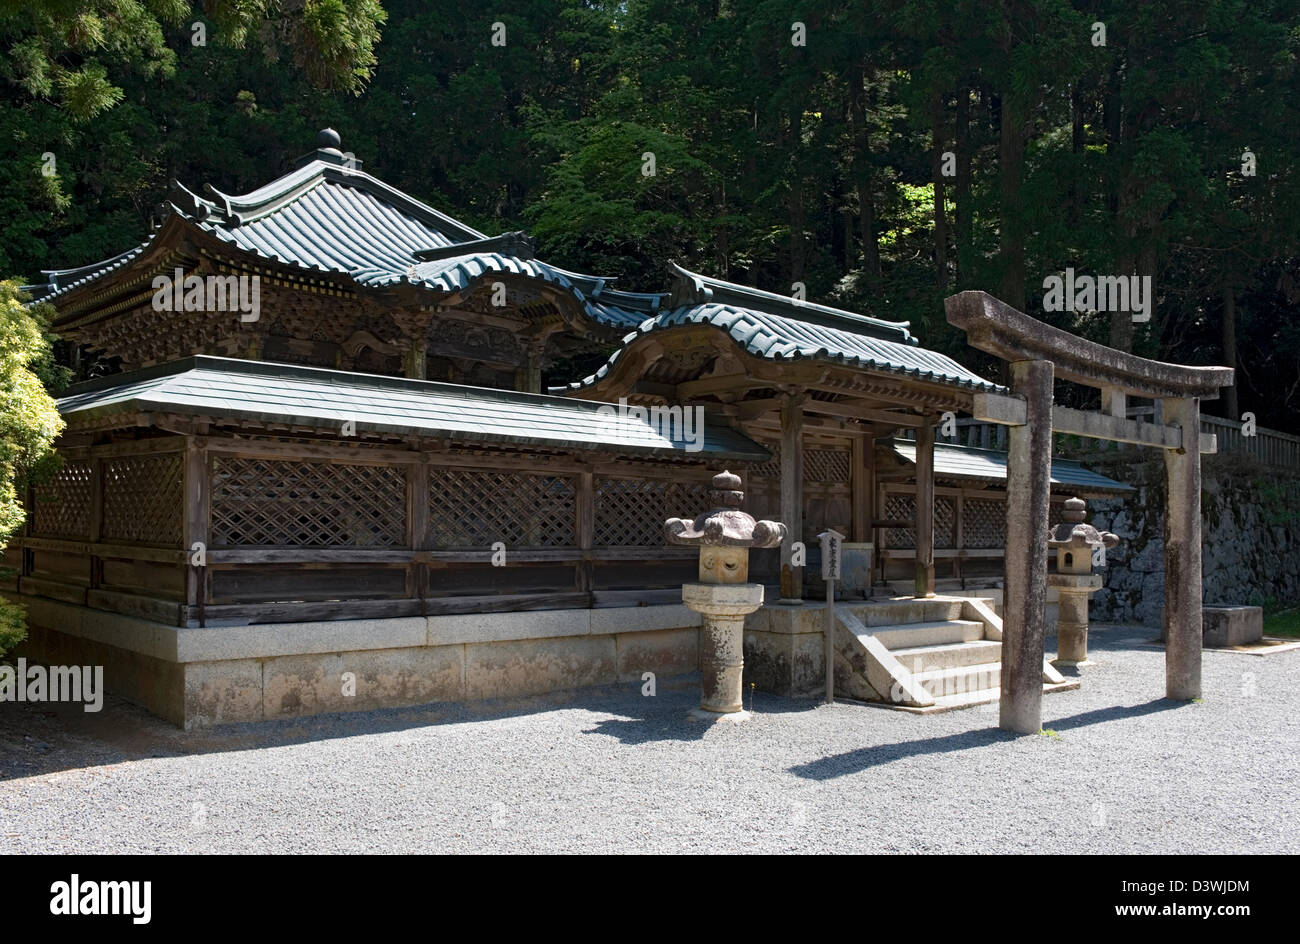 Tokugawa family mausoleum on Mount Koya built by shogun Tokugawa Iemitsu for father Hidetada and grandfather Tokugawa - Stock Image